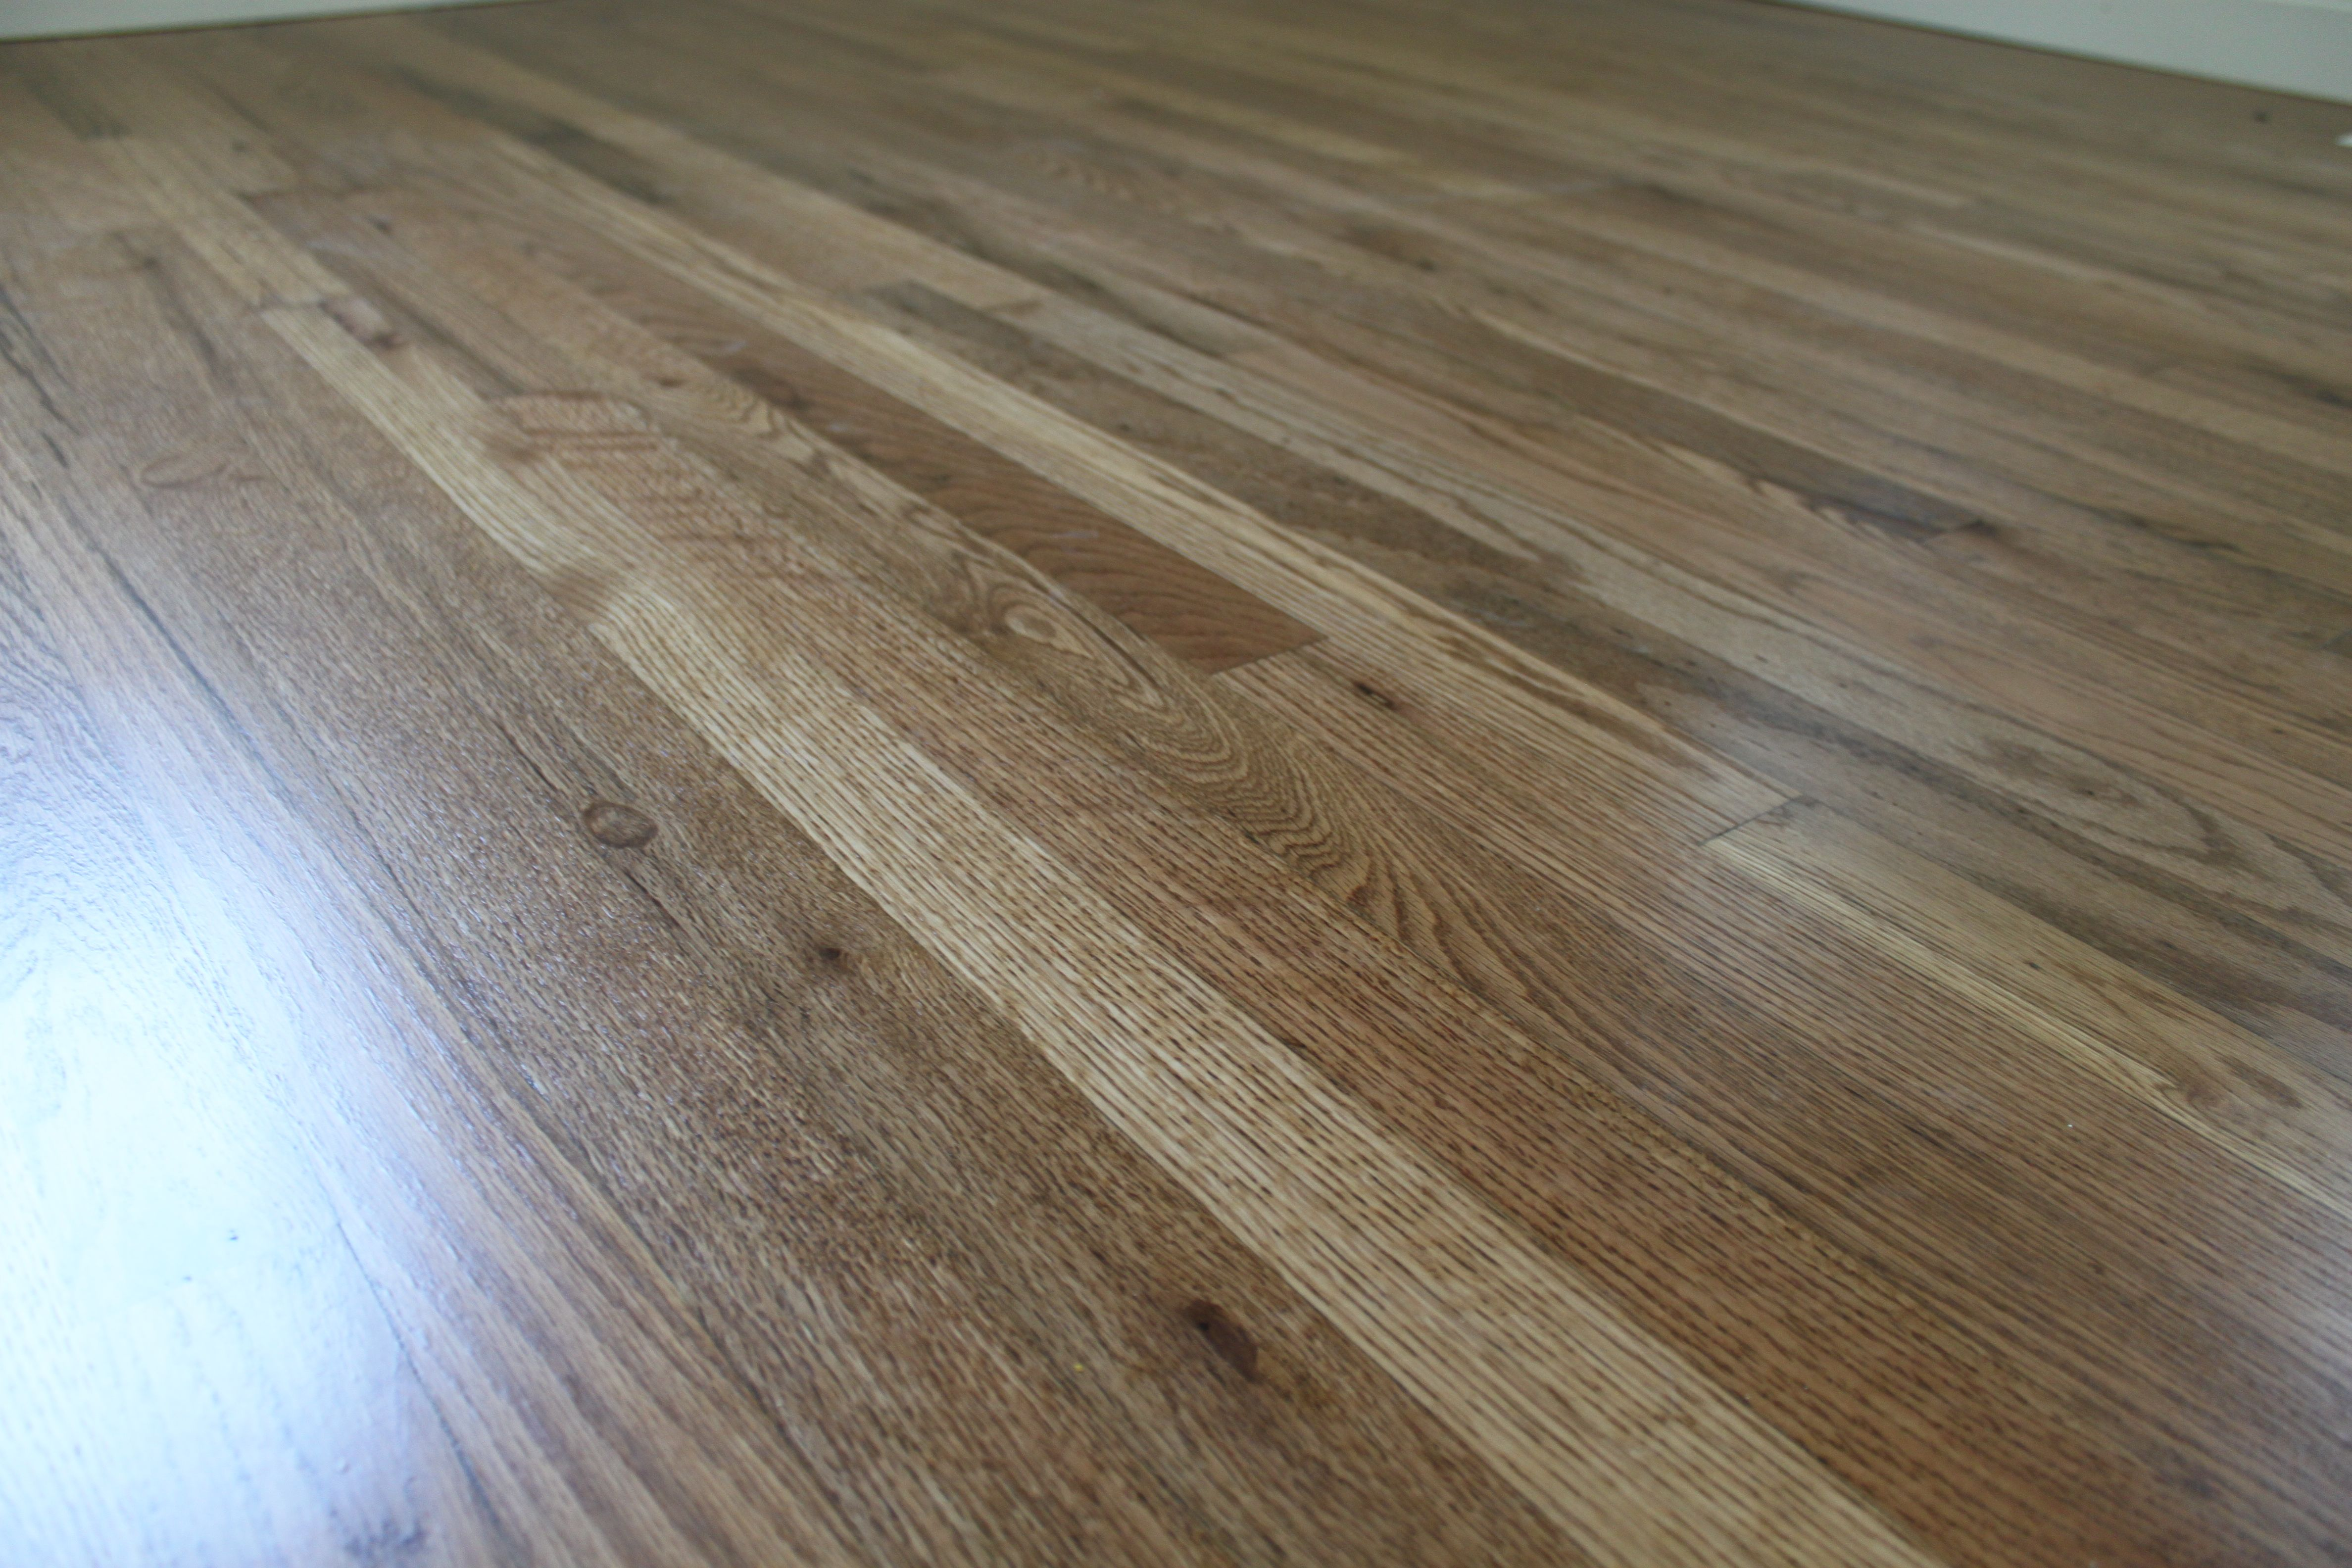 Red oak hardwood floor stained Puritan Pine Stain ...